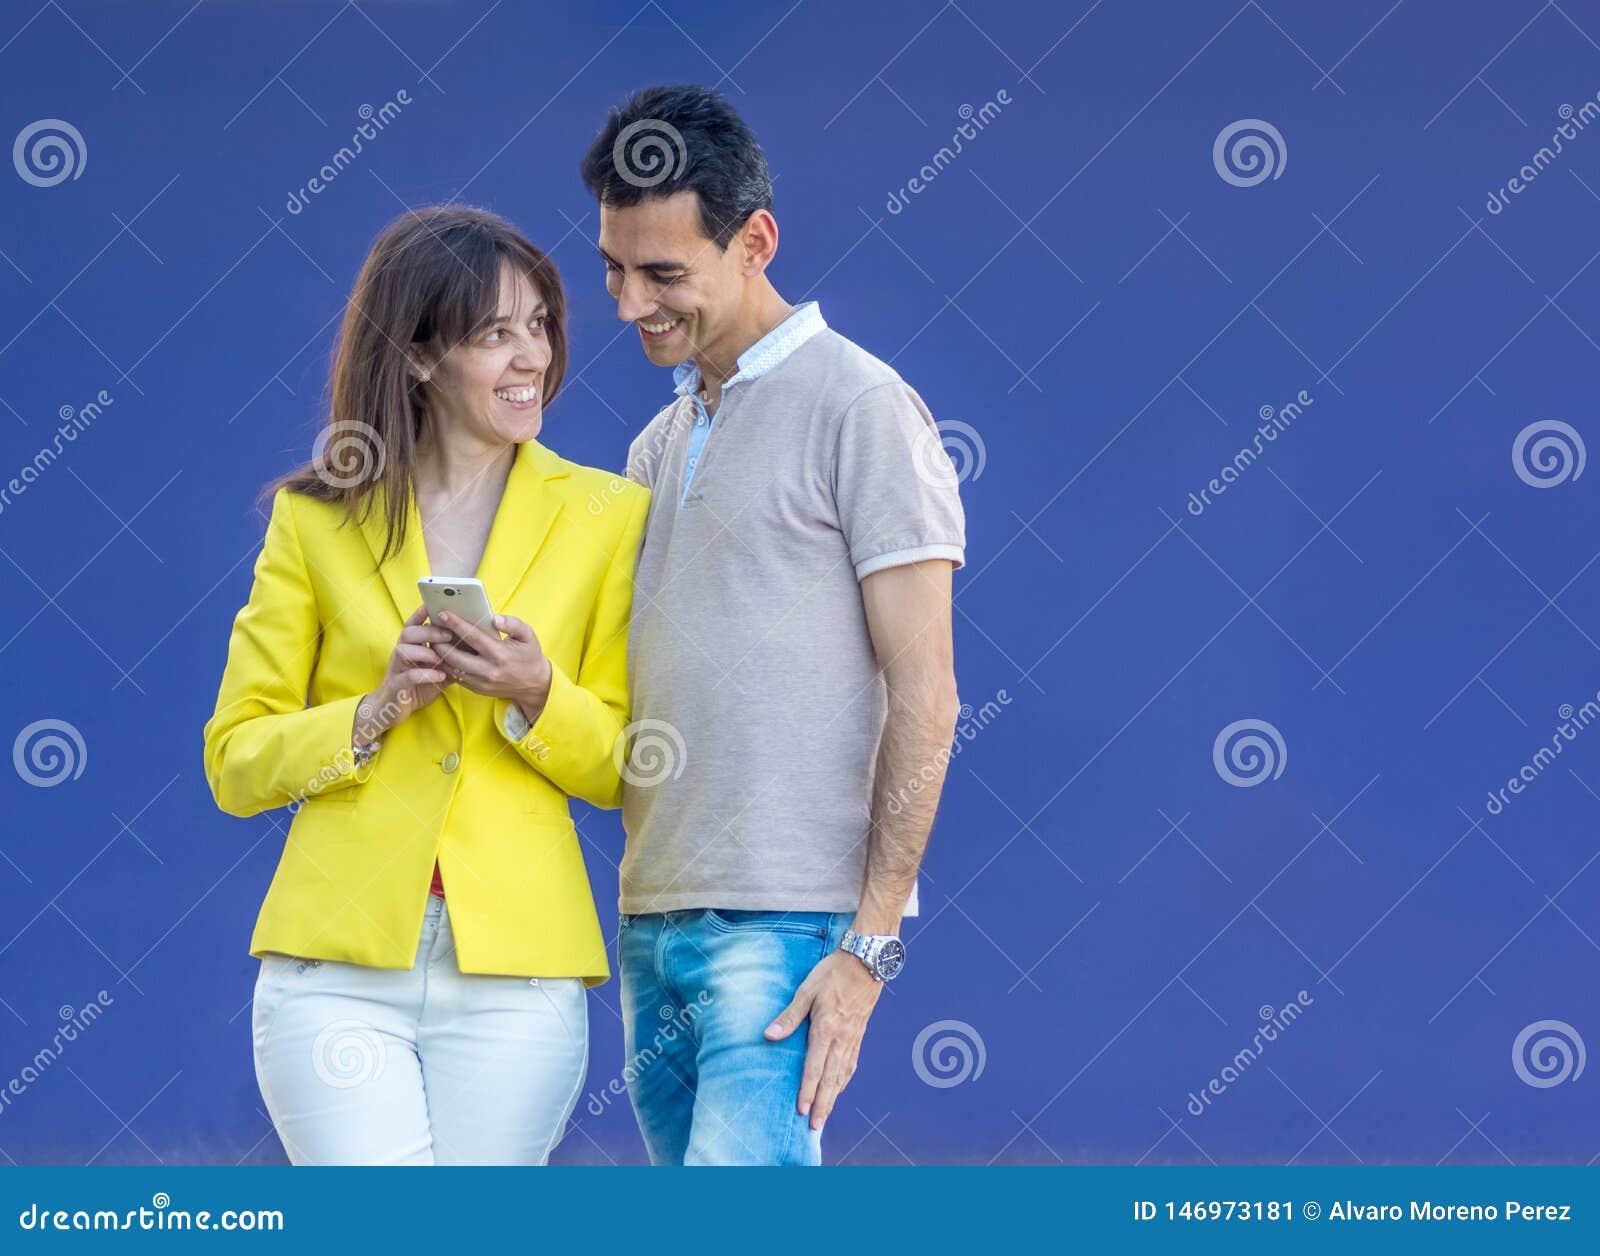 Couple smiling on blue background